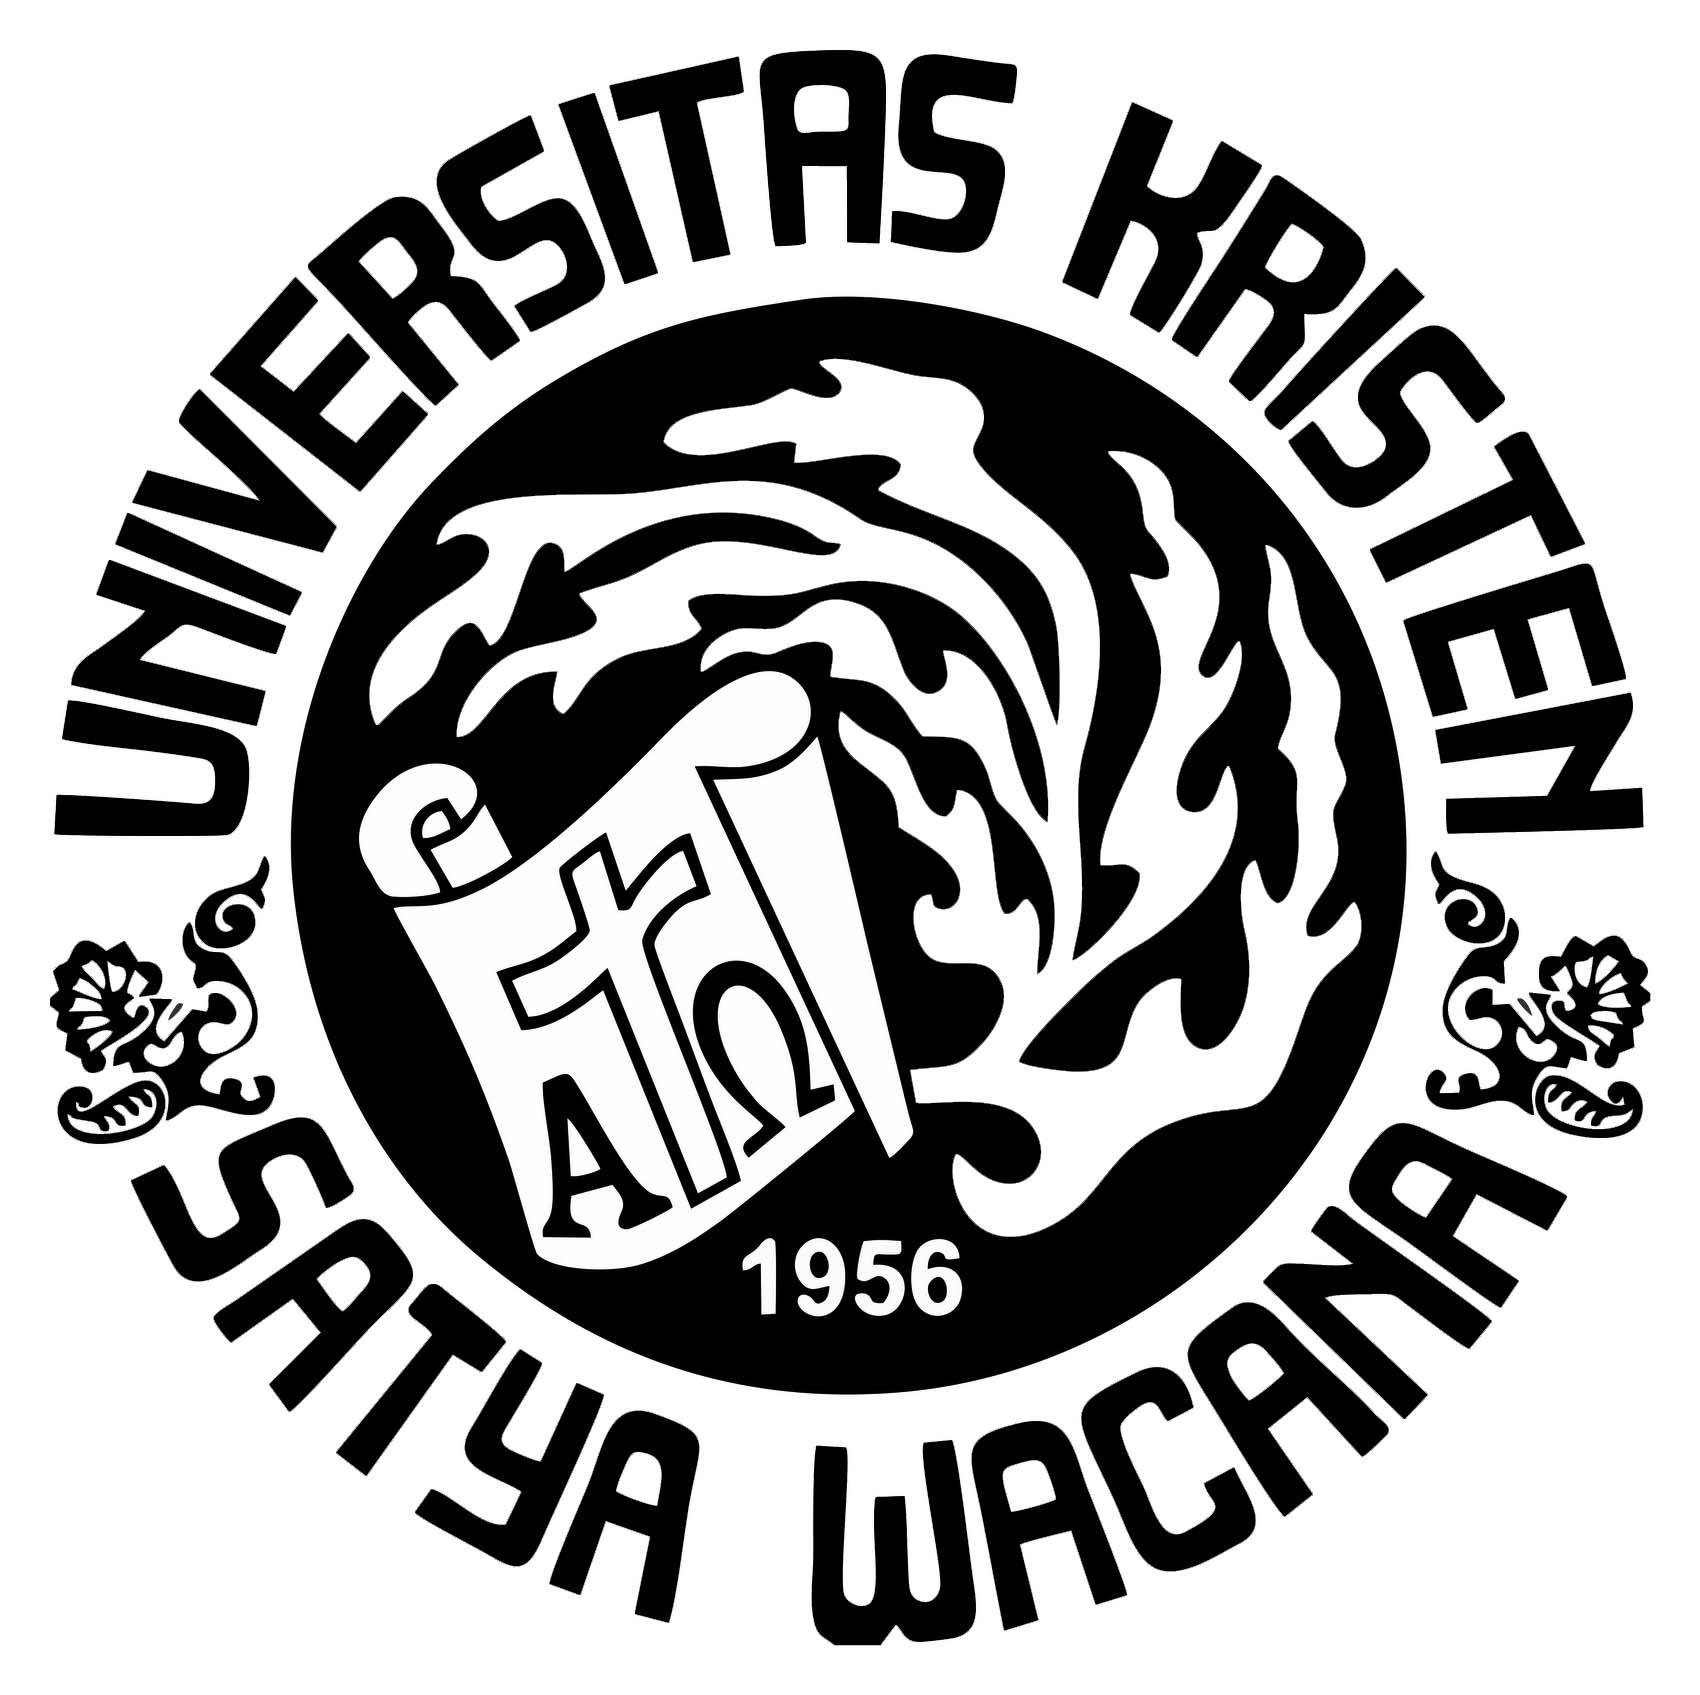 Logo UKSW (Universitas Kristen Satya Wacana) Hitam Putih